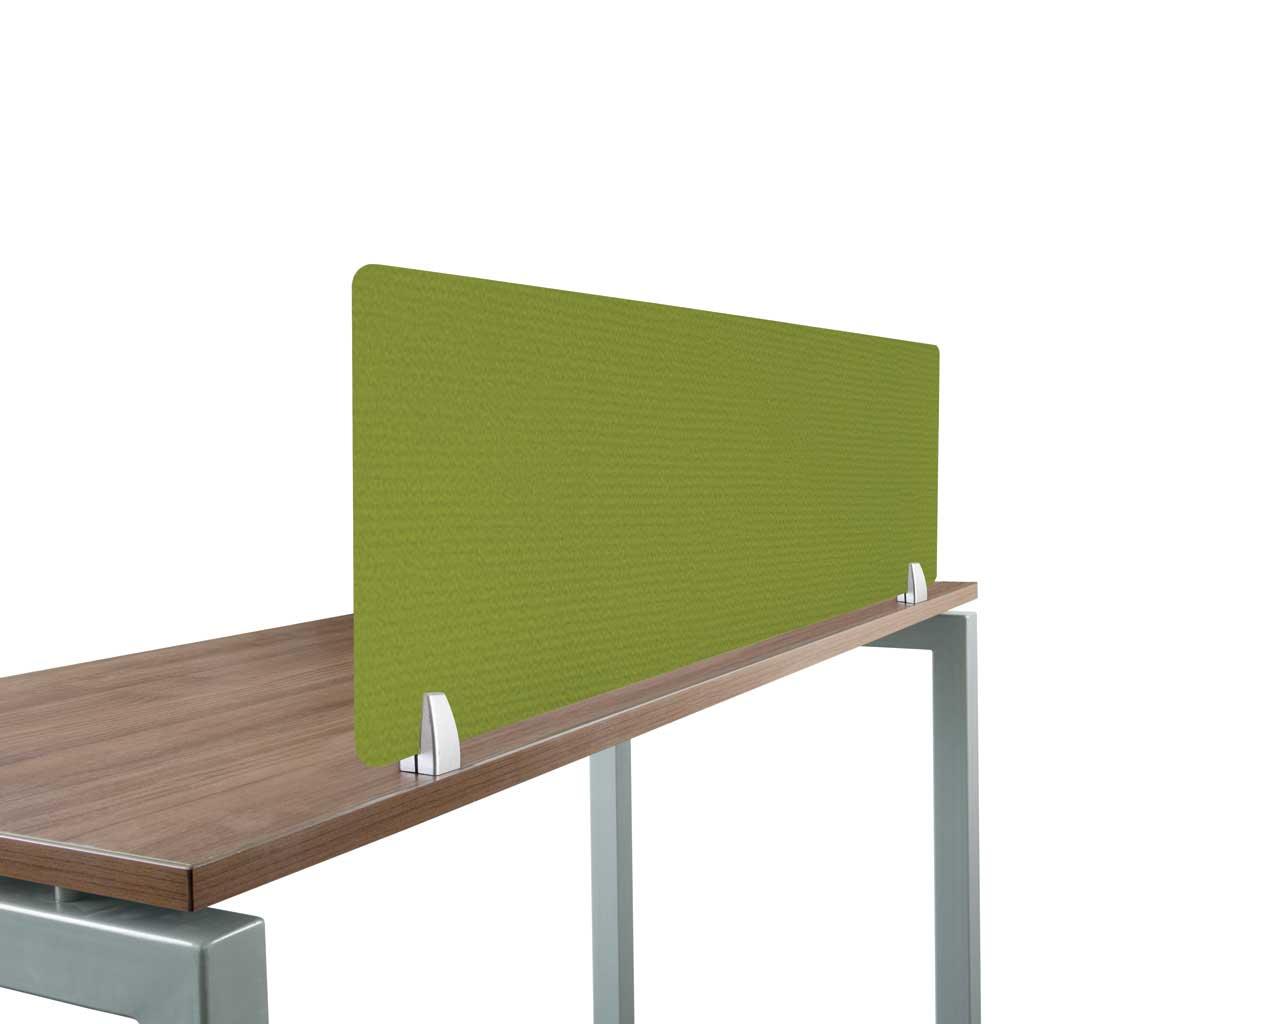 Green Fabric Panel